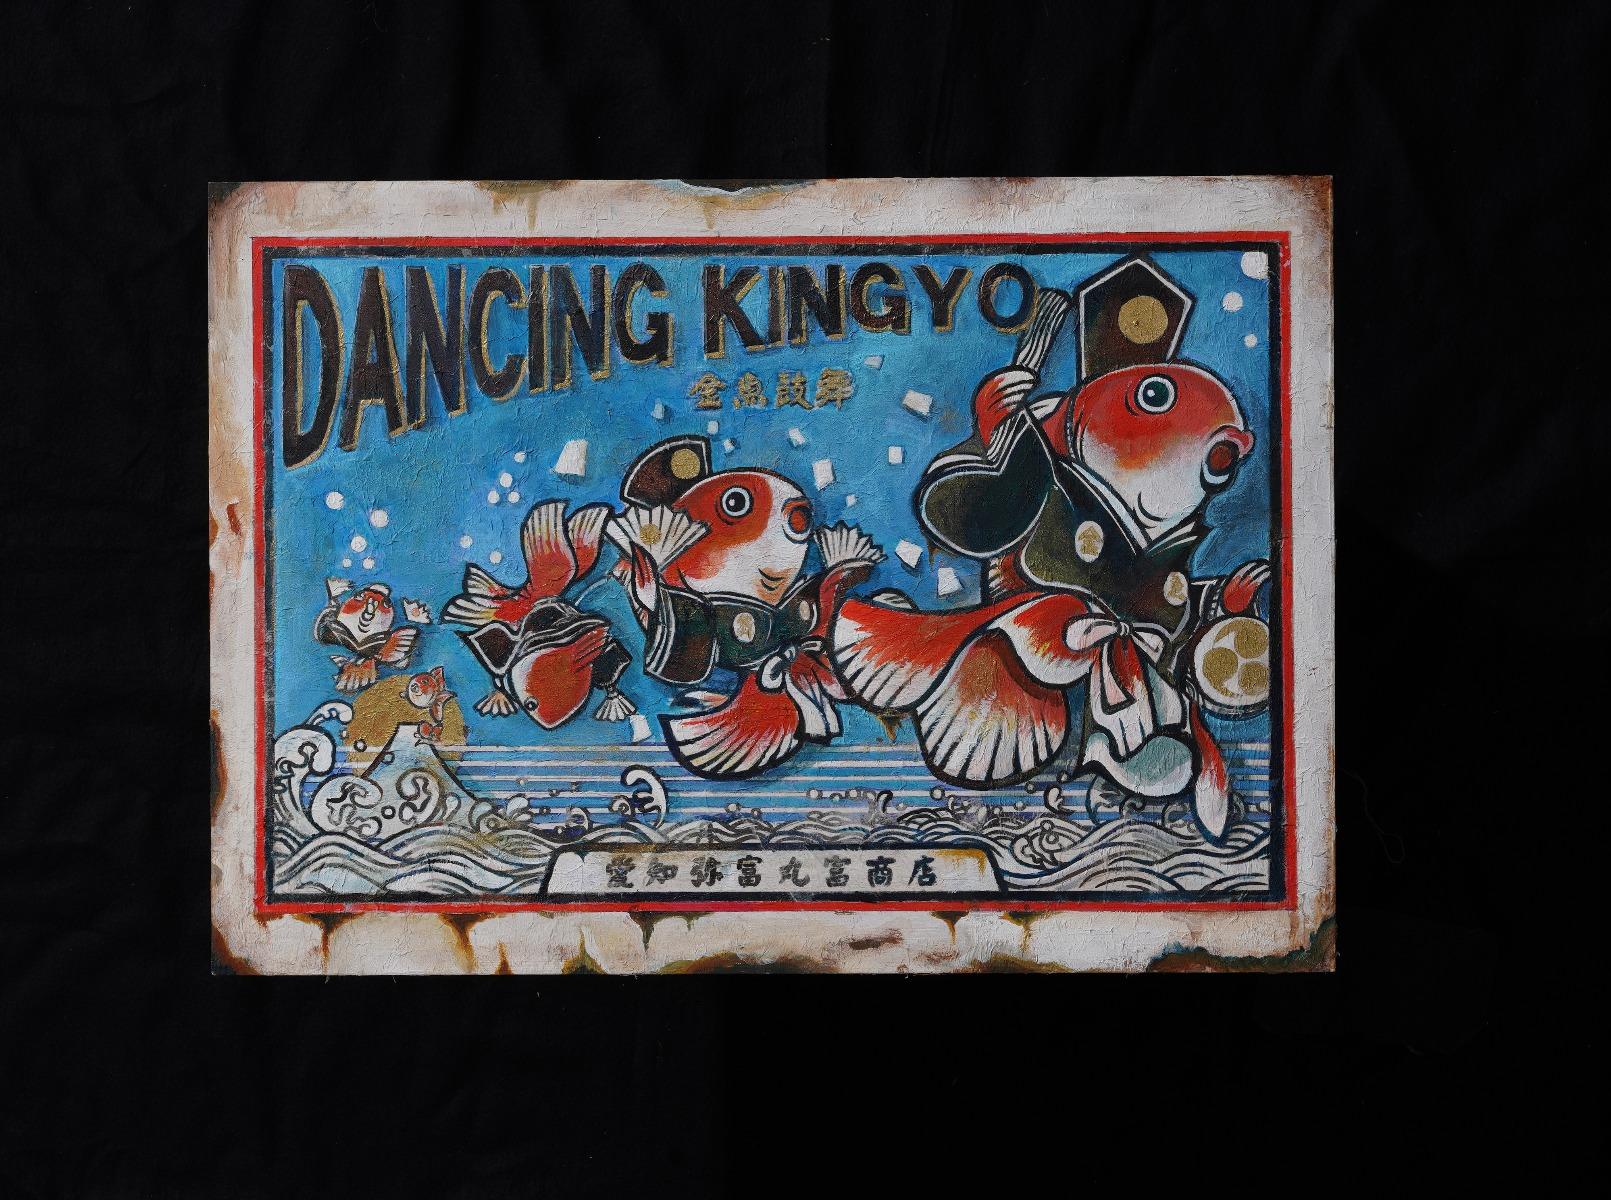 Dancing Kingyo (Goldenfish)